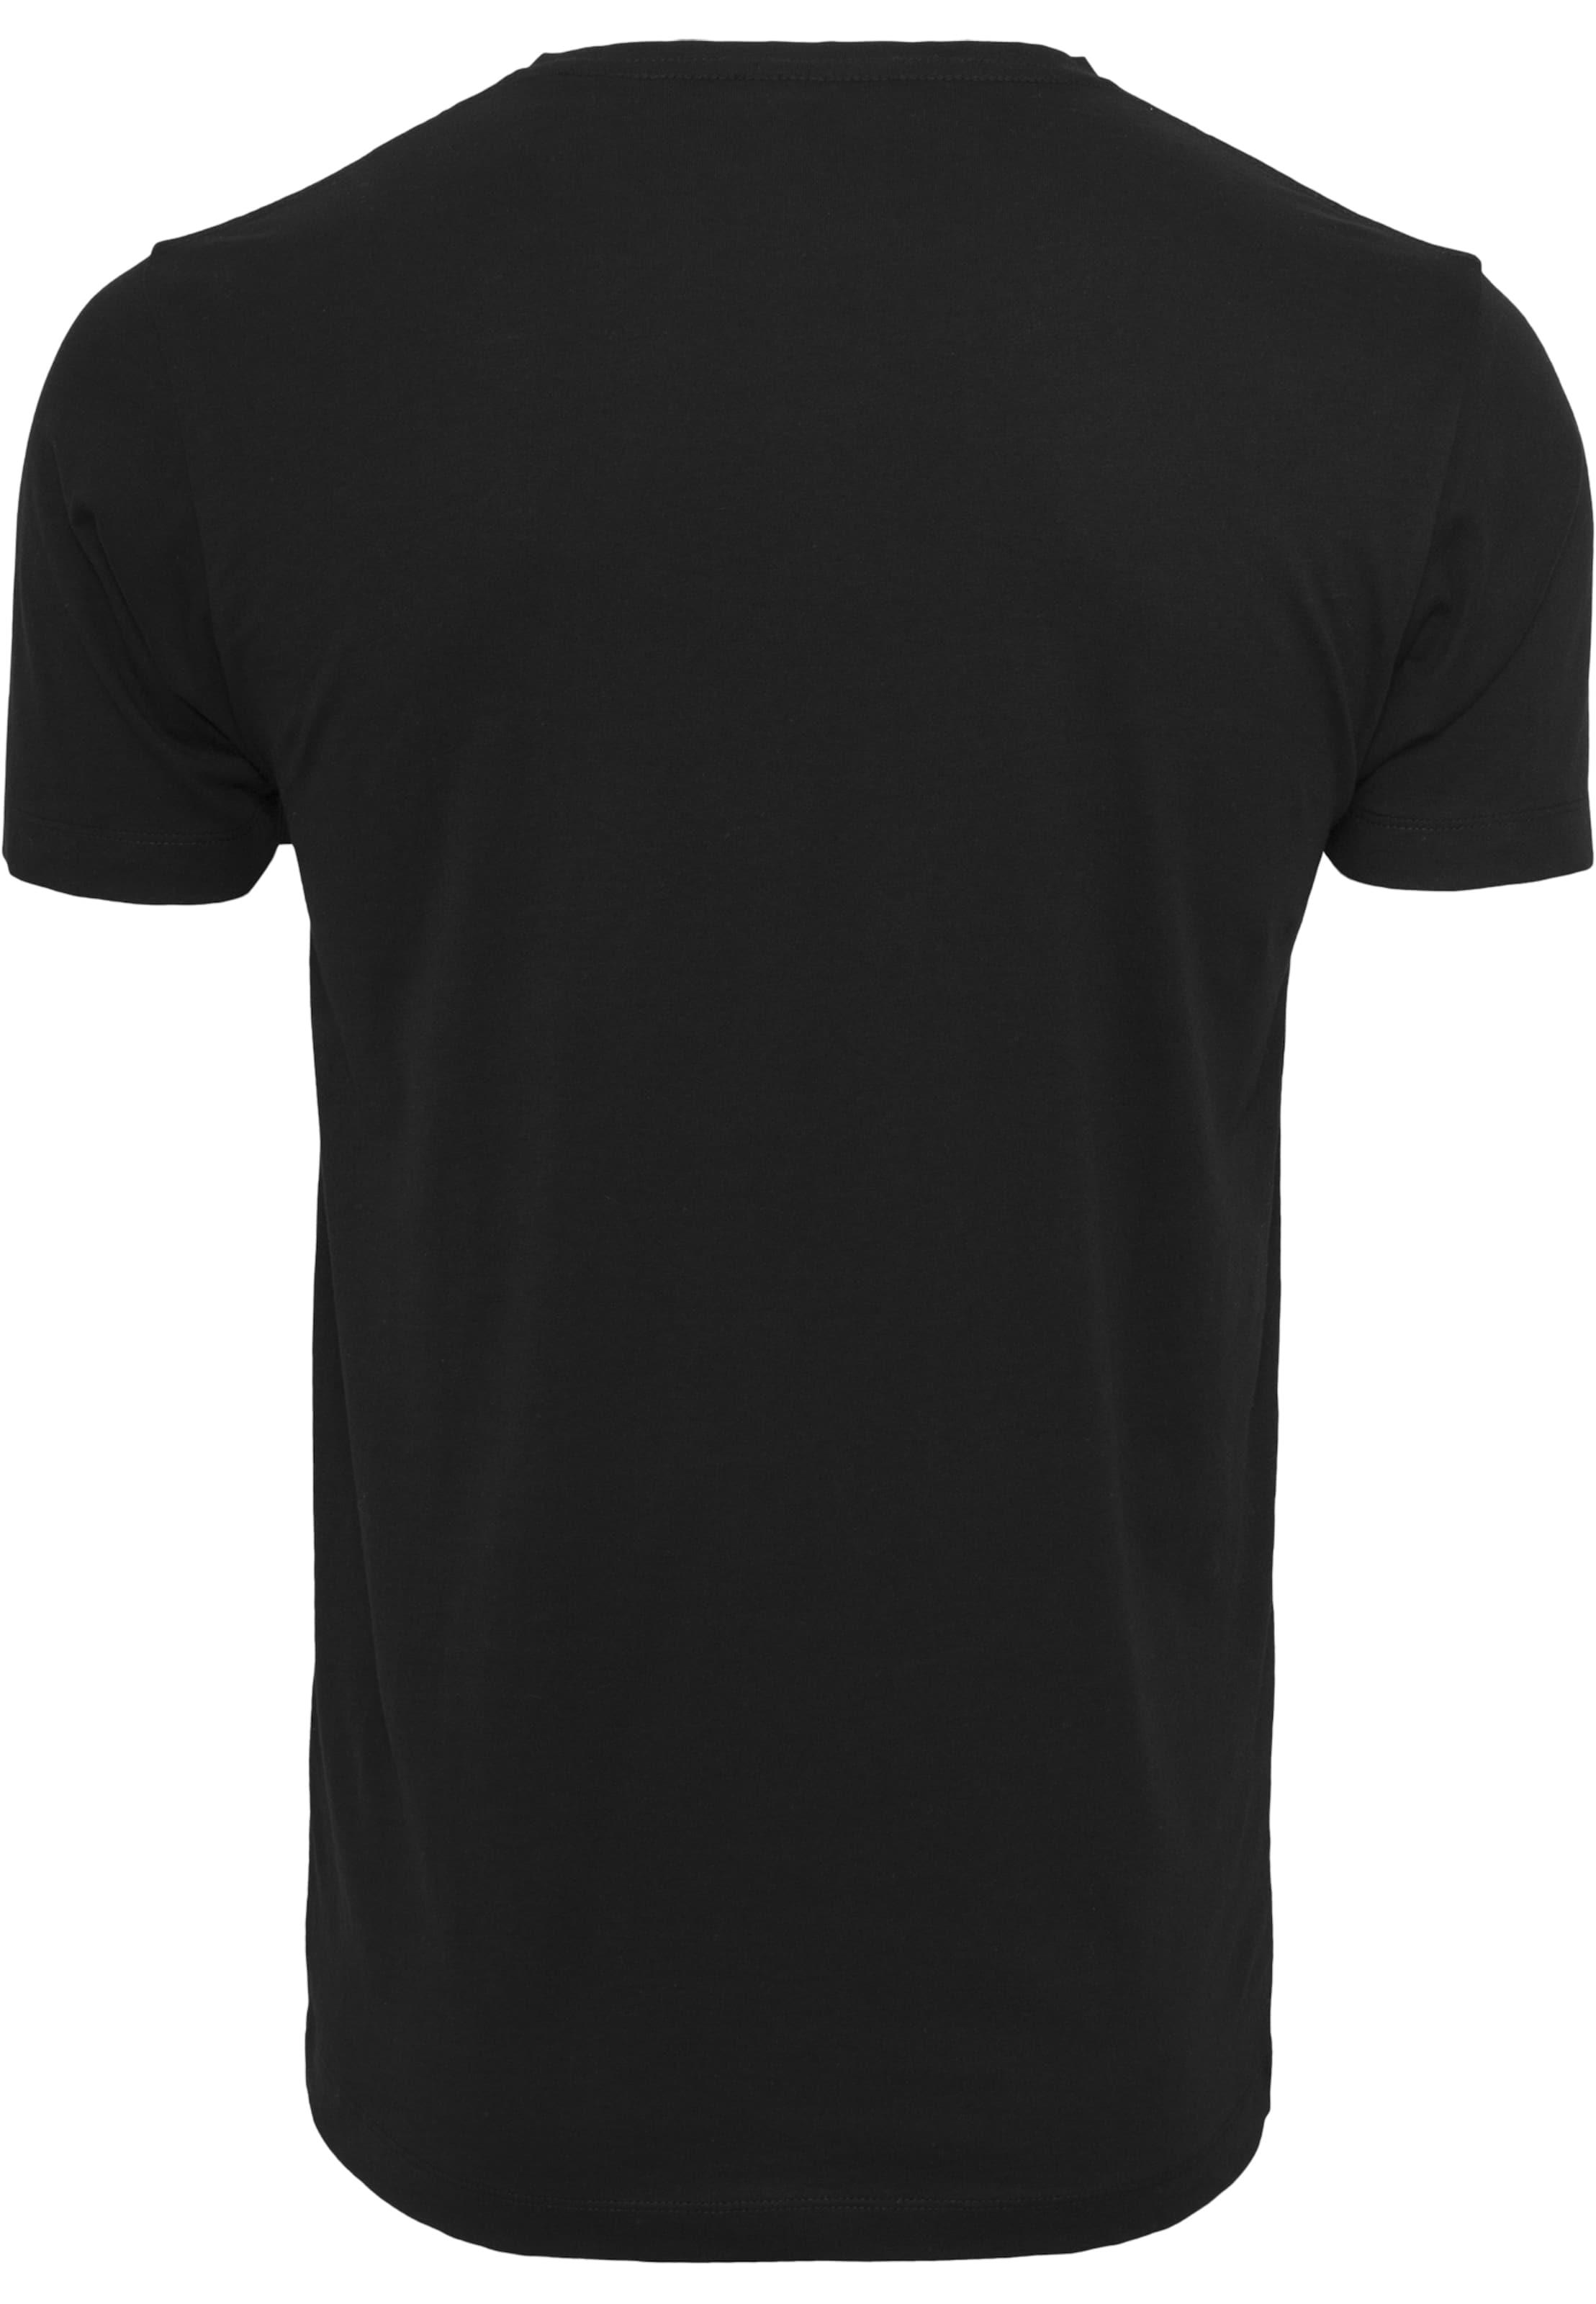 HellgrauSchwarz shirt In T 'skull' Tee Mister nXNk08PwO